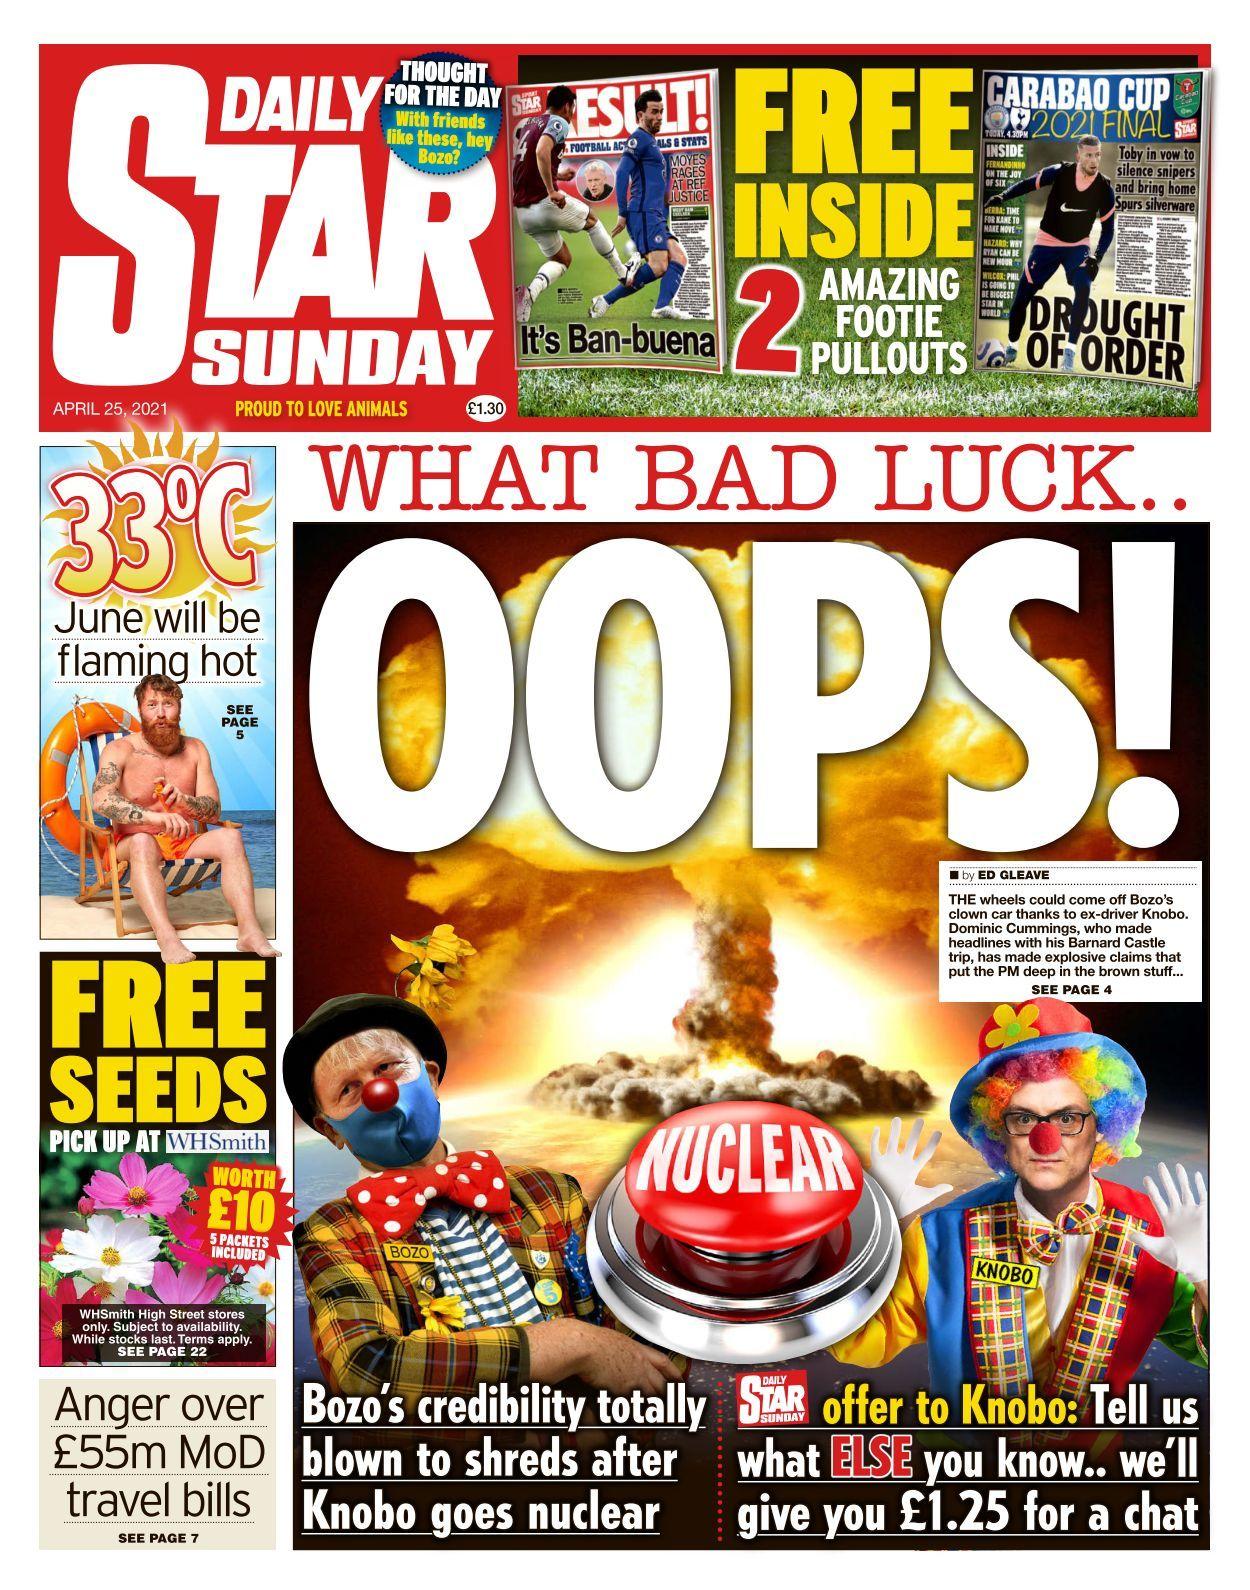 Daily Star Sunday   20 20 20